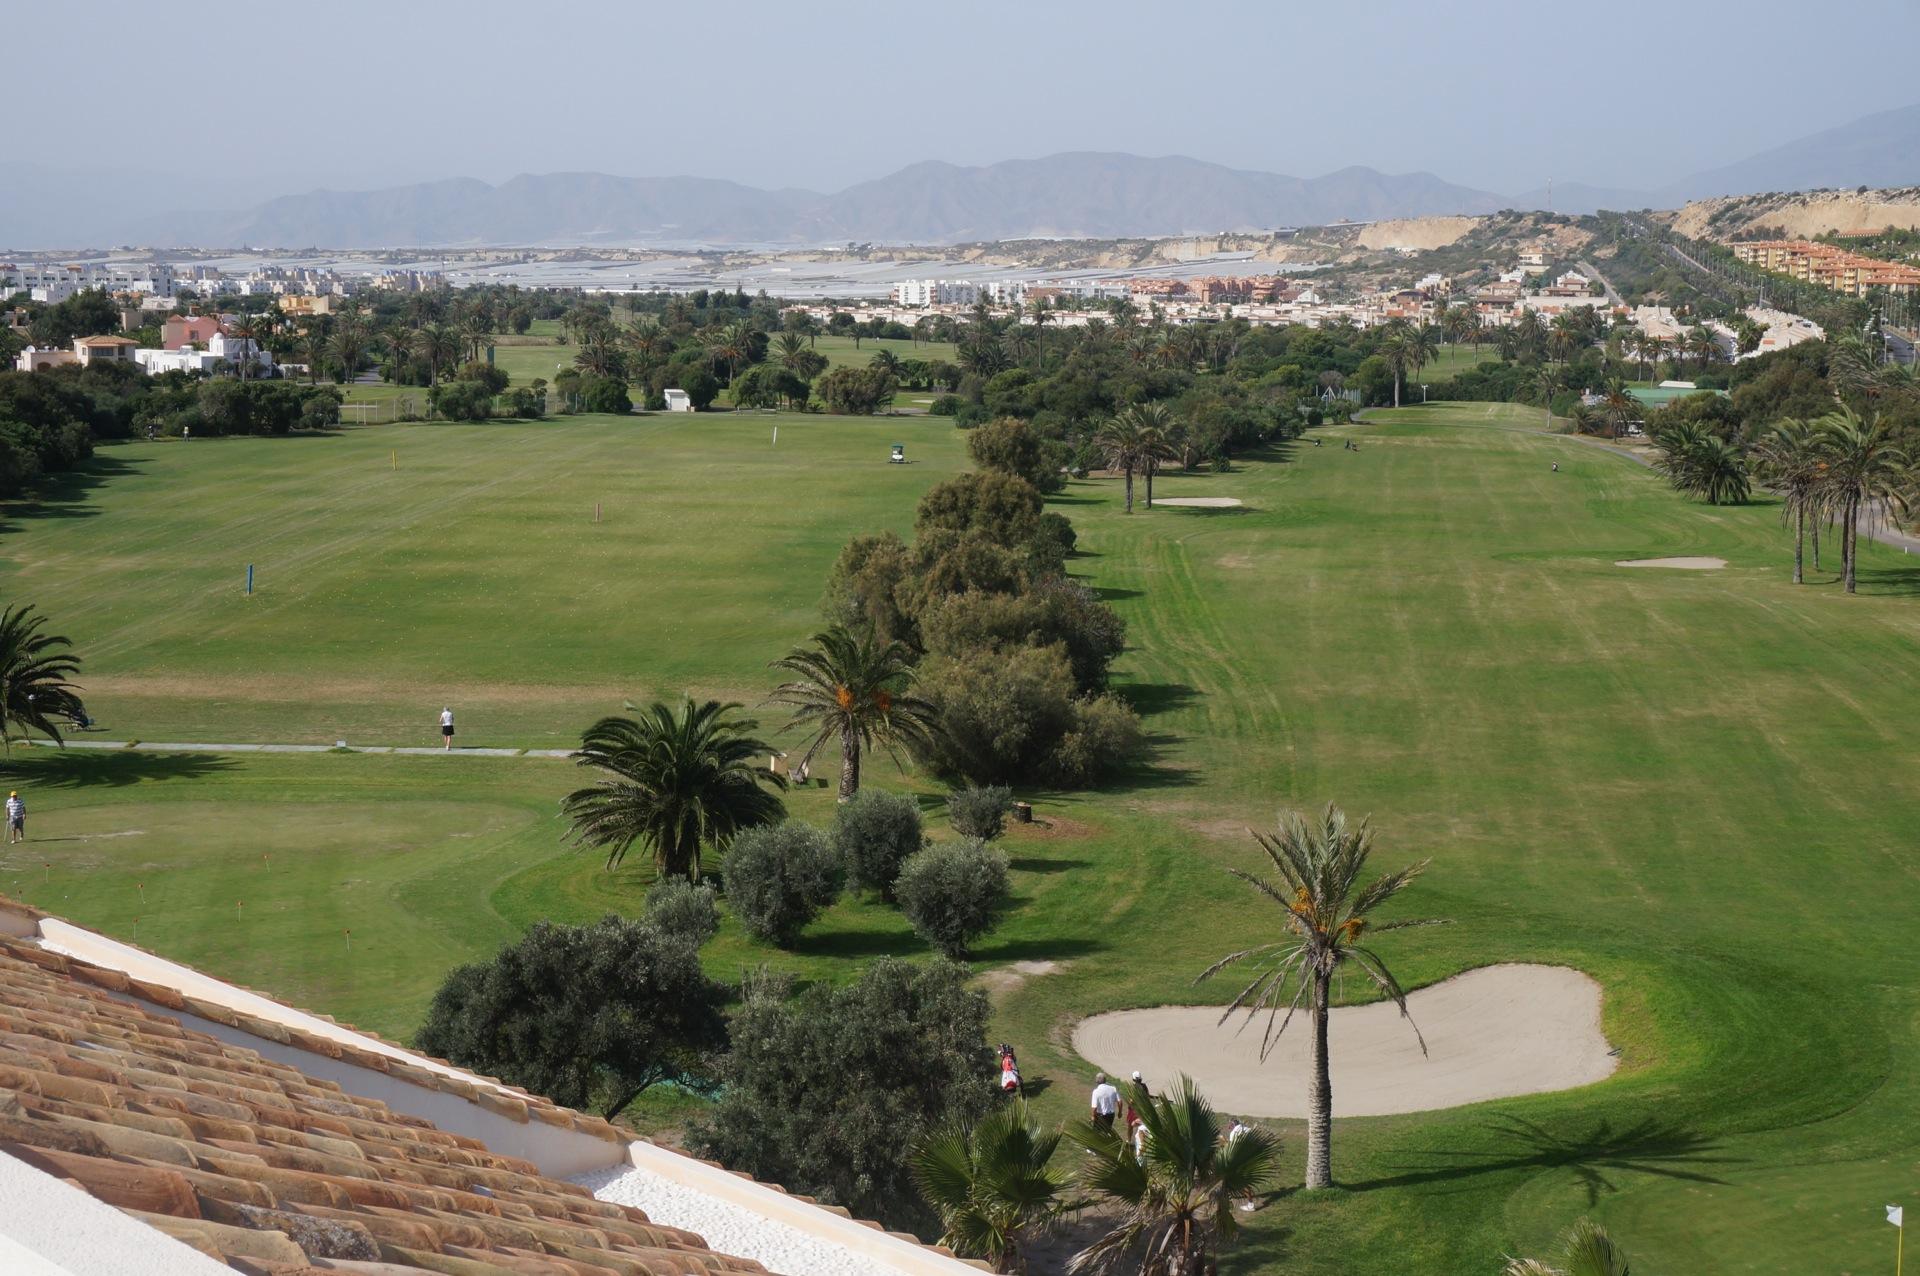 Espagne 2014 la r gion d 39 almeria - Petit bassin d eau dijon ...